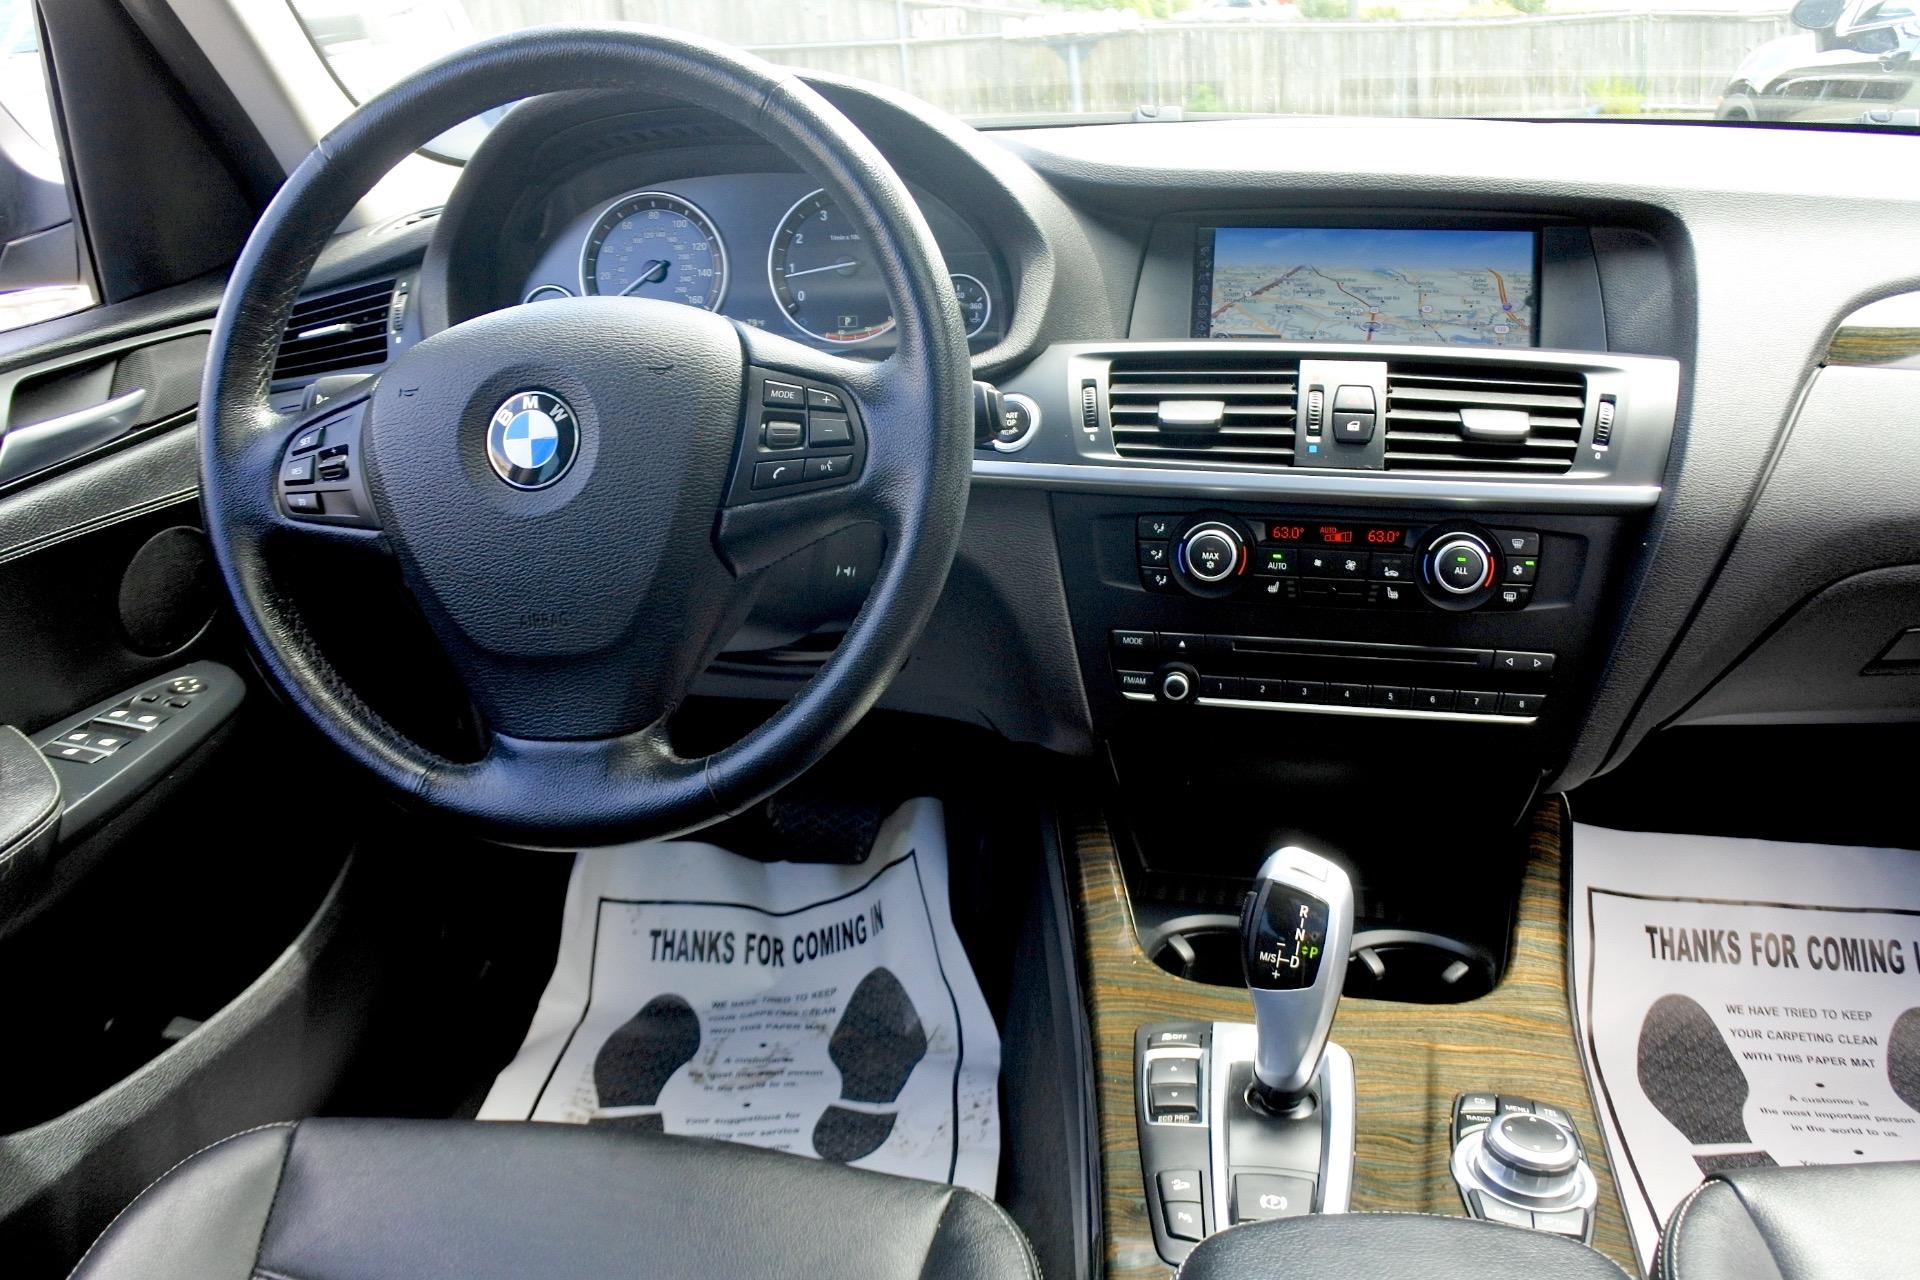 Used 2013 BMW X3 AWD 4dr xDrive28i Used 2013 BMW X3 AWD 4dr xDrive28i for sale  at Metro West Motorcars LLC in Shrewsbury MA 10